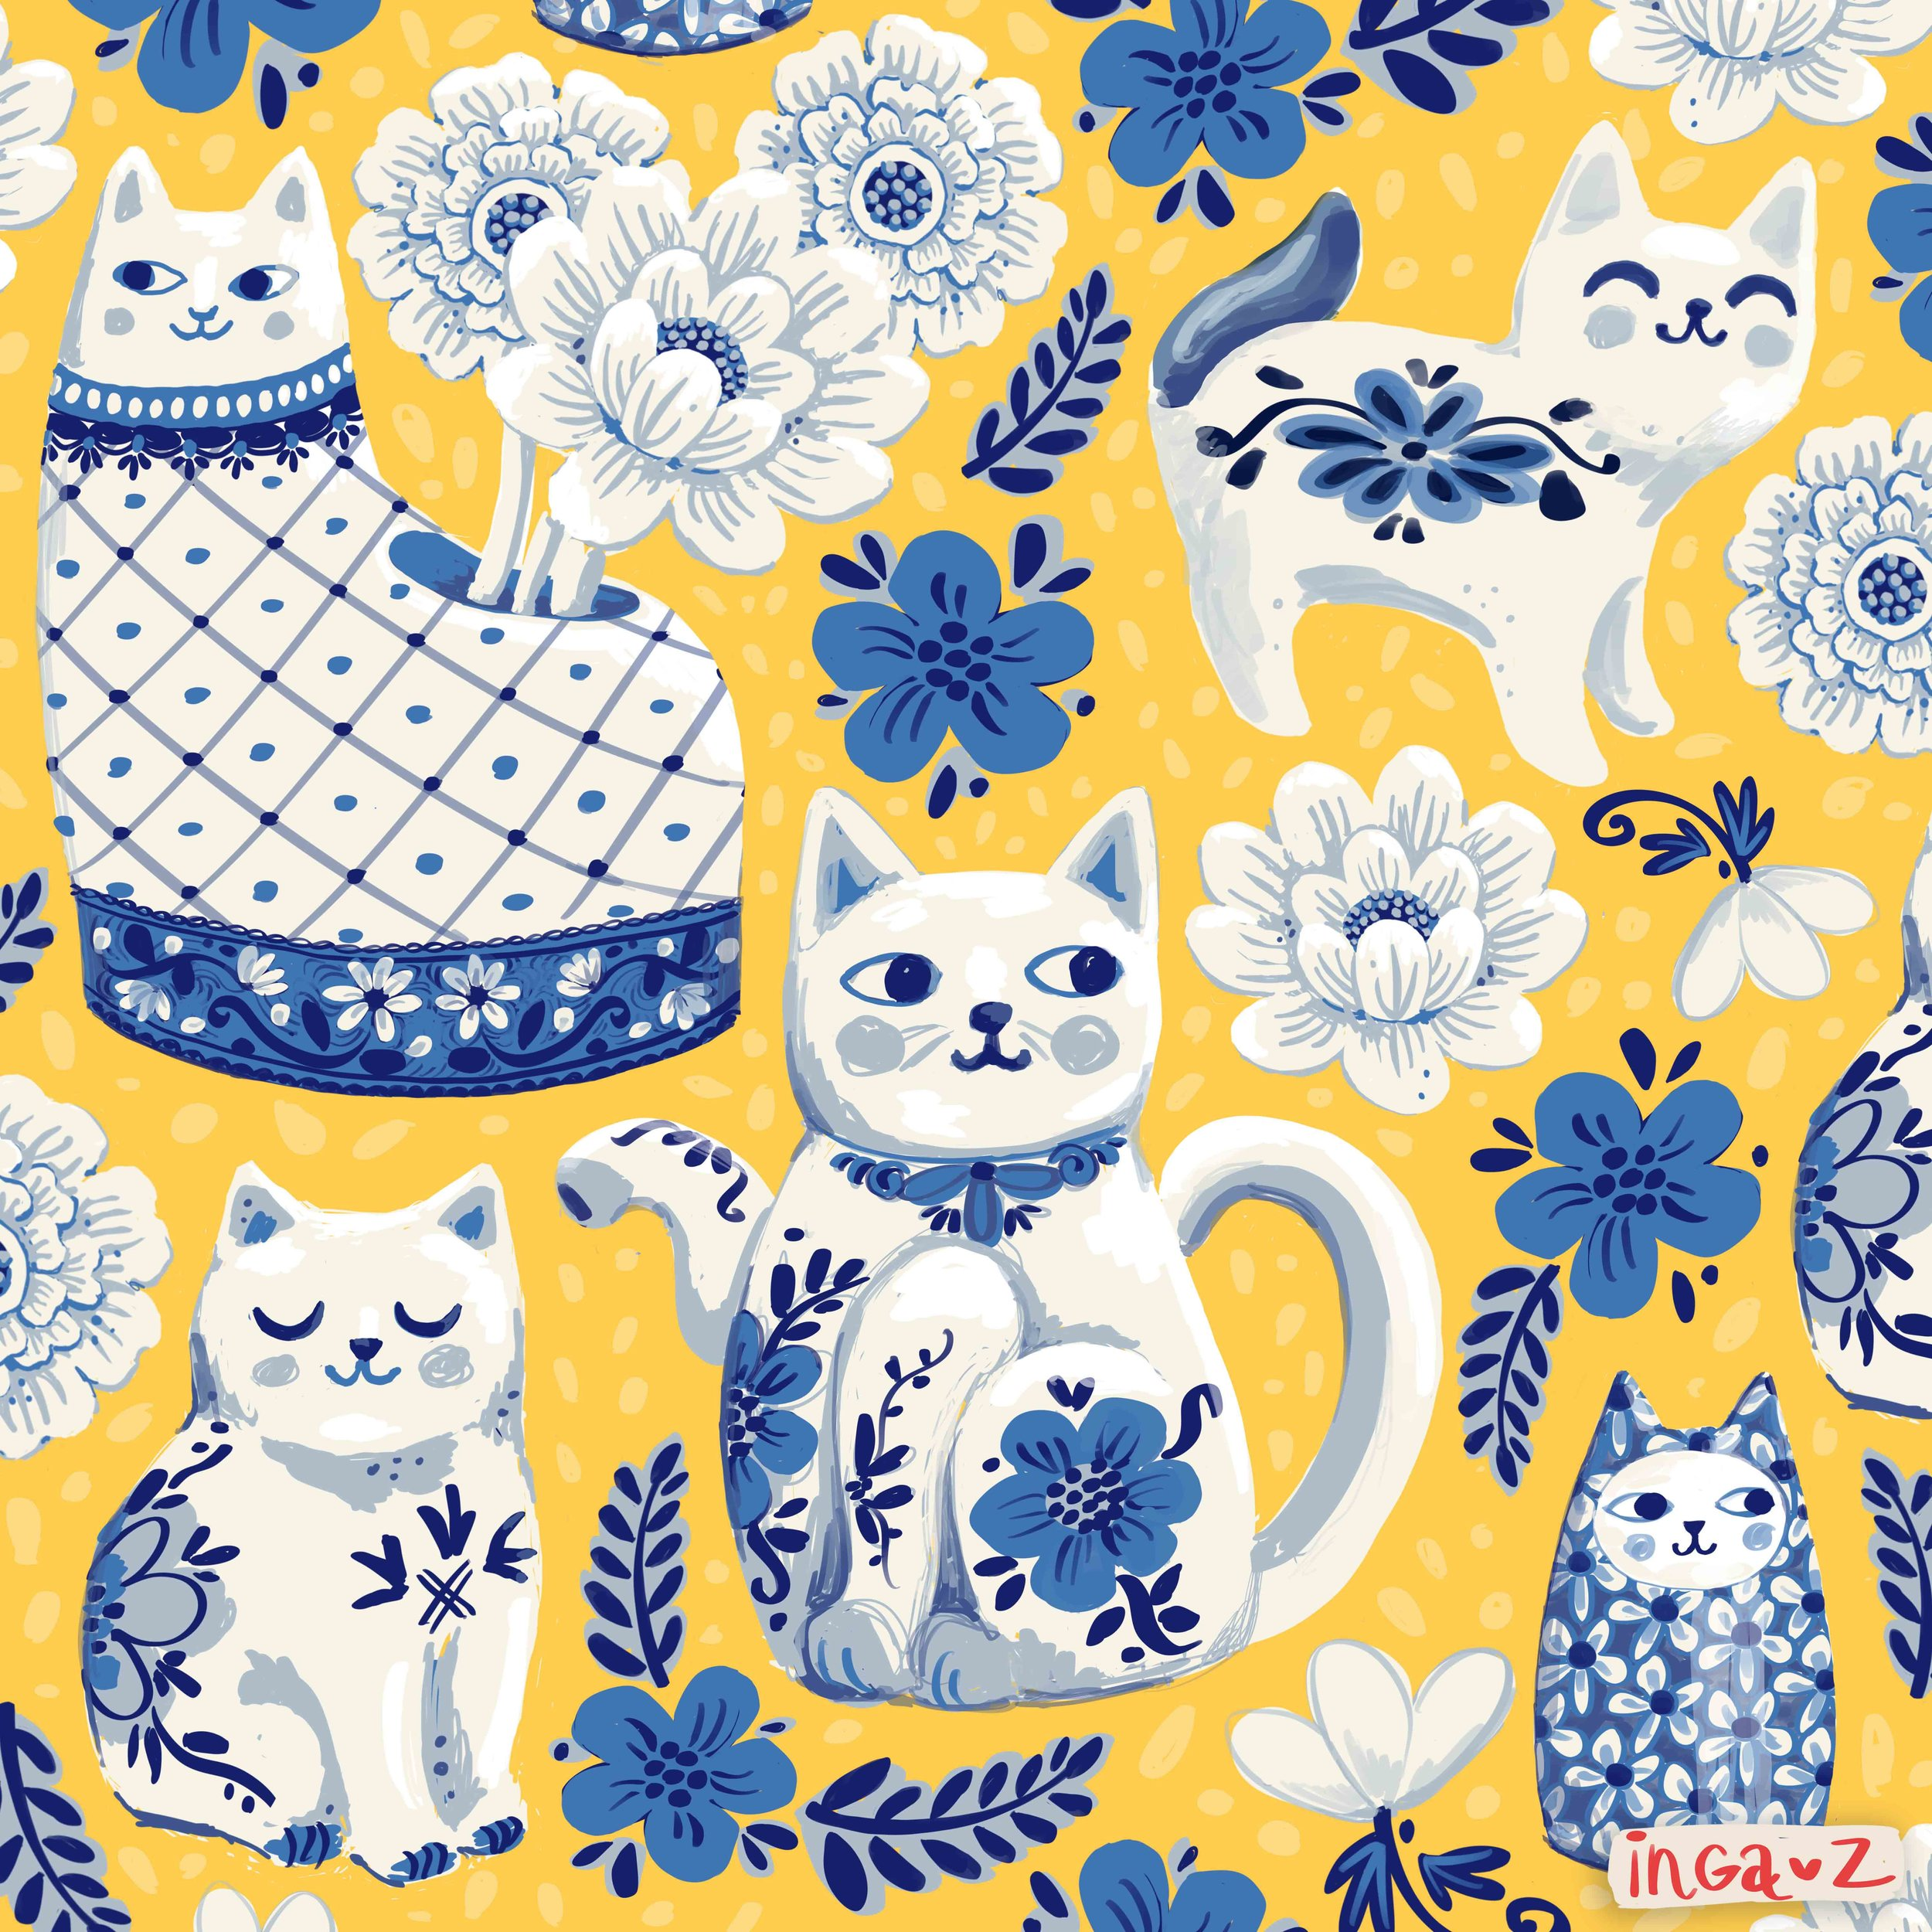 indigo cats pattern.jpg